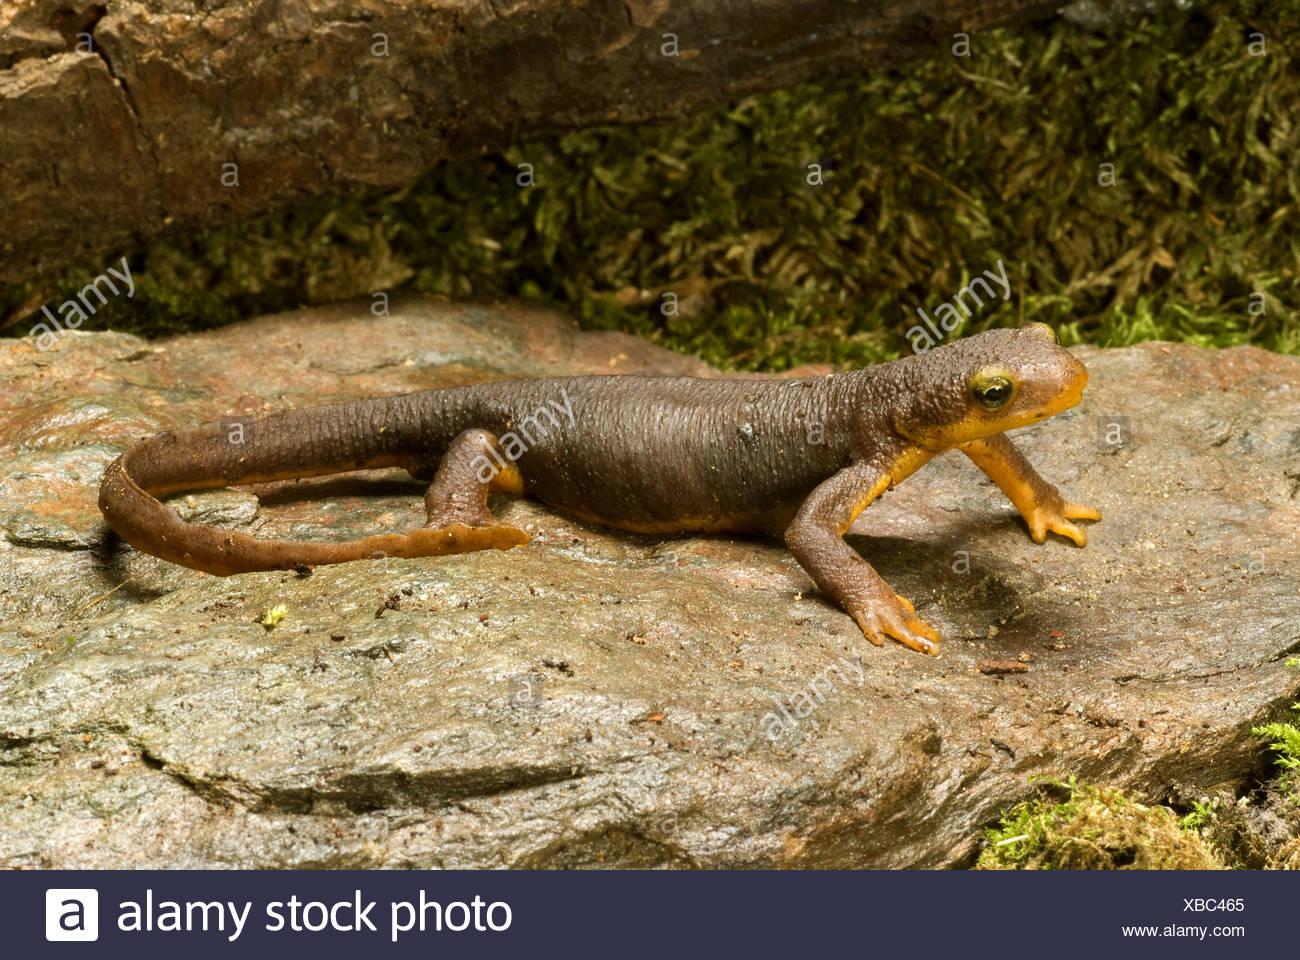 California newt (Taricha torosa), on a stone Stock Photo